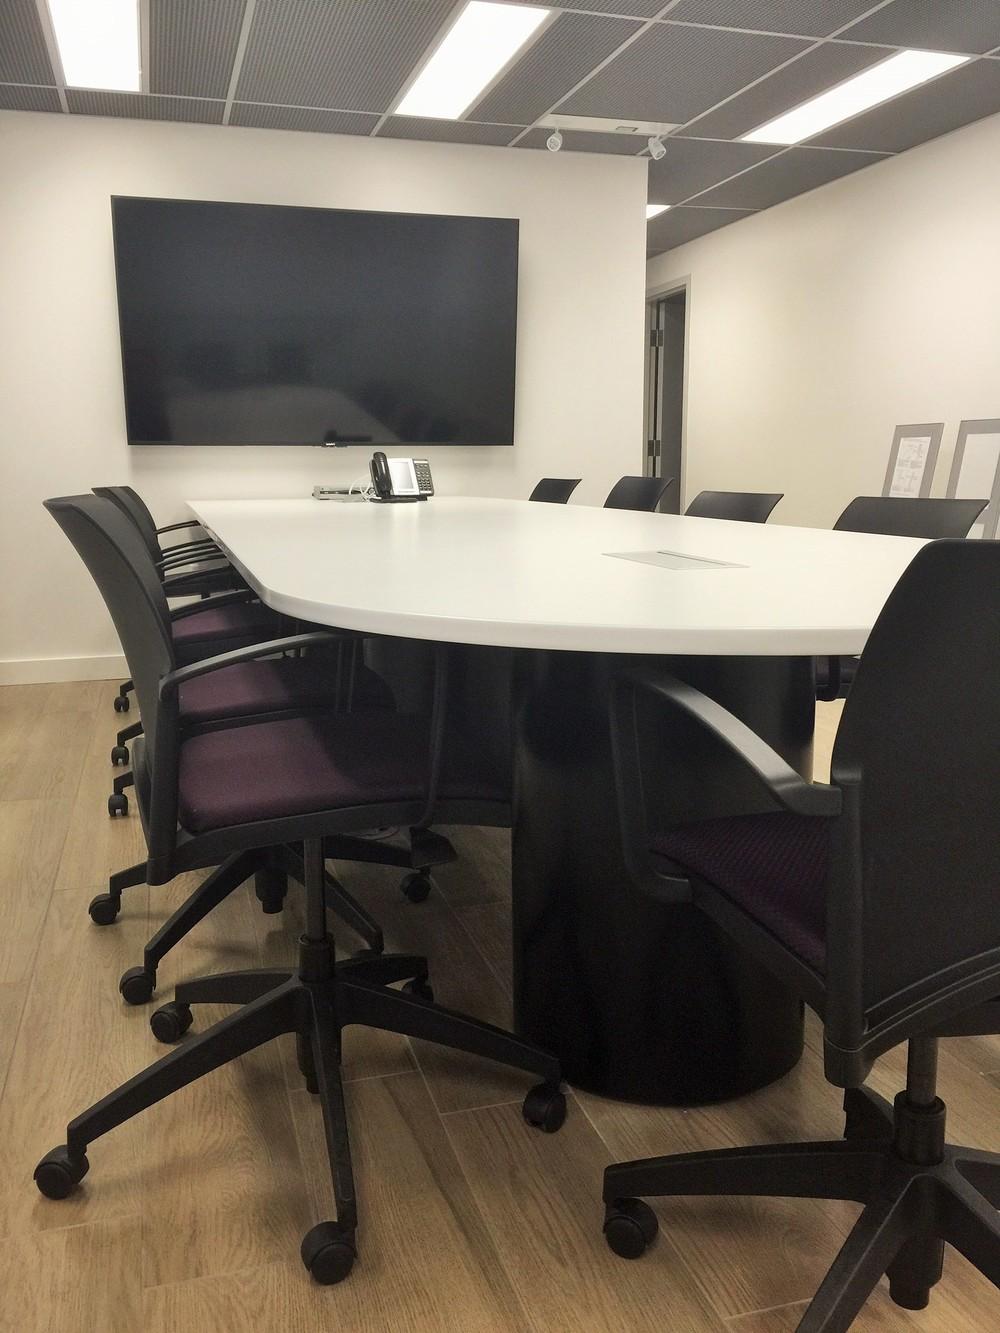 Taylor audi boardroom.JPG